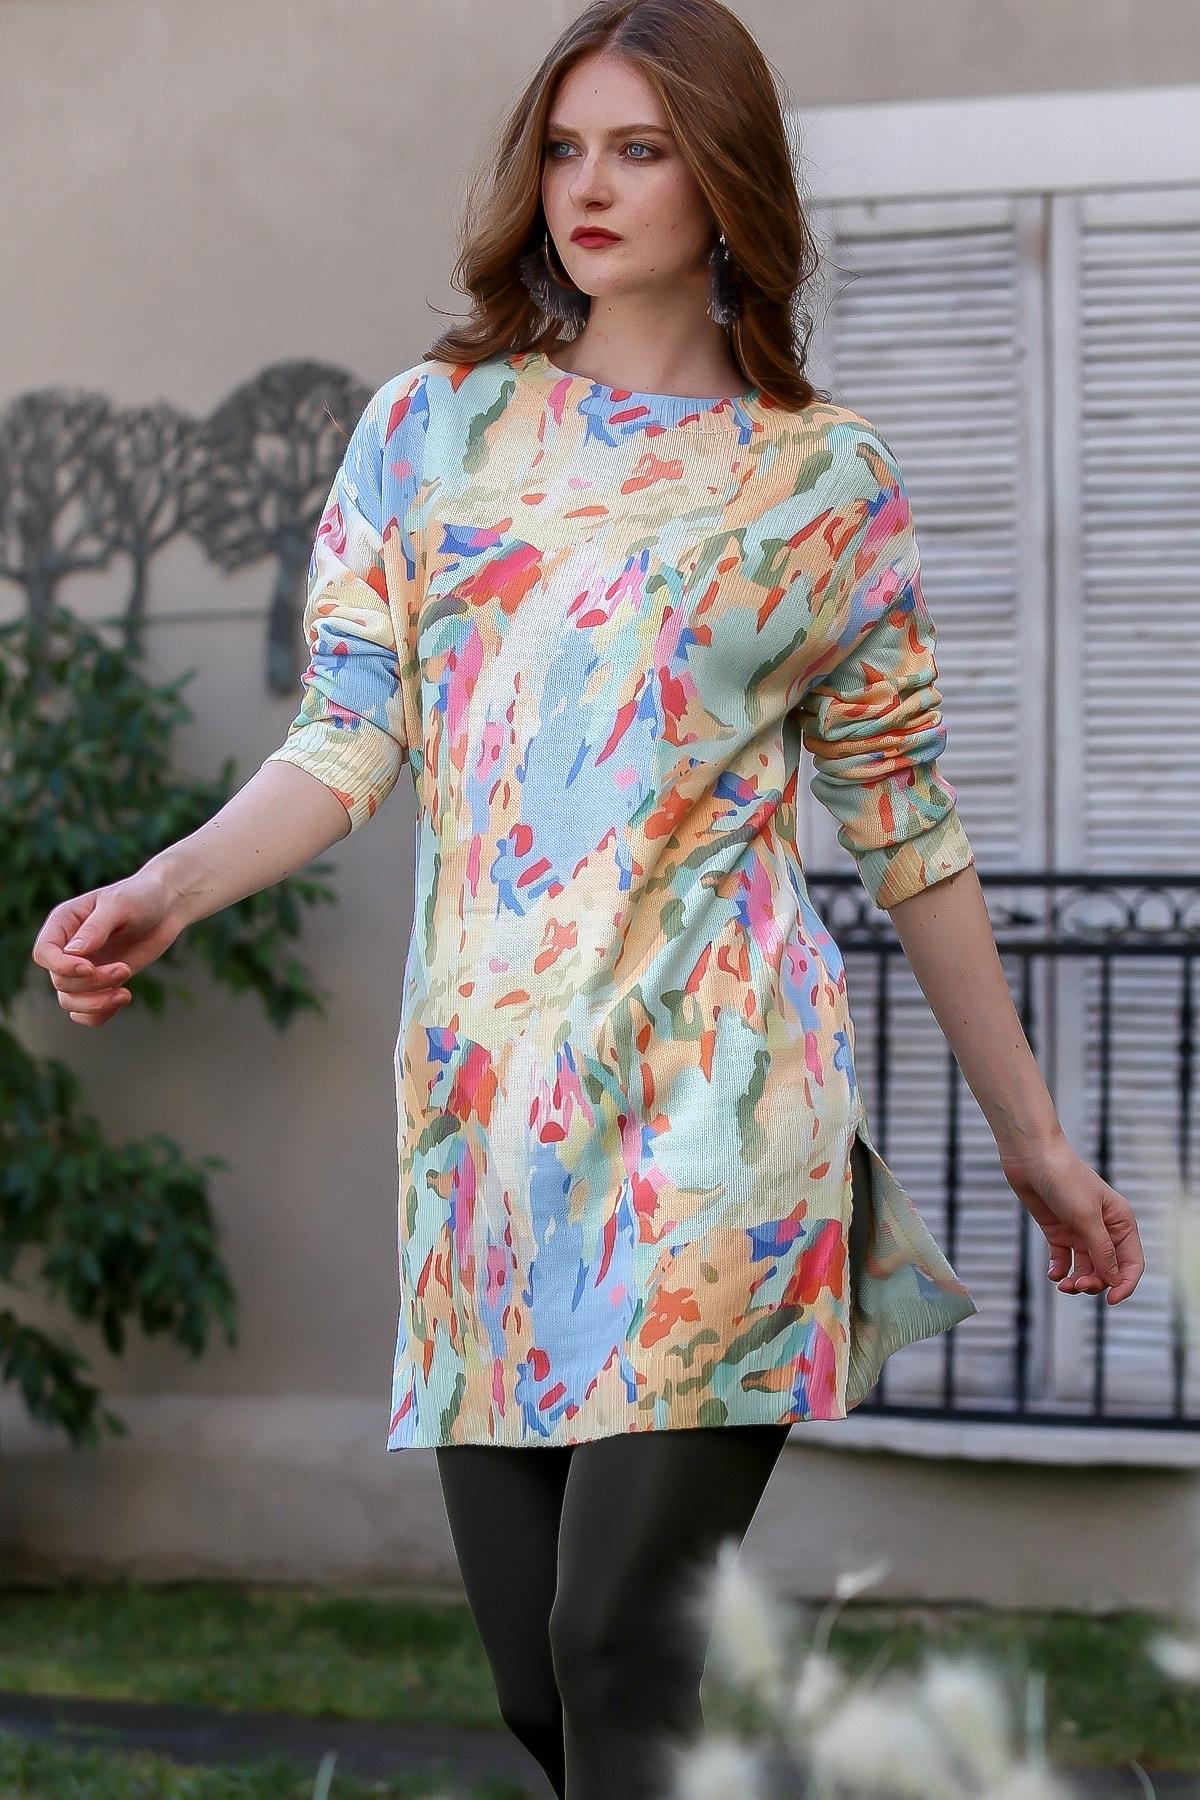 Chiccy Kadın Ekru-Pembe Casual Floral Desenli Tunik Kazak M10010800KZ99462